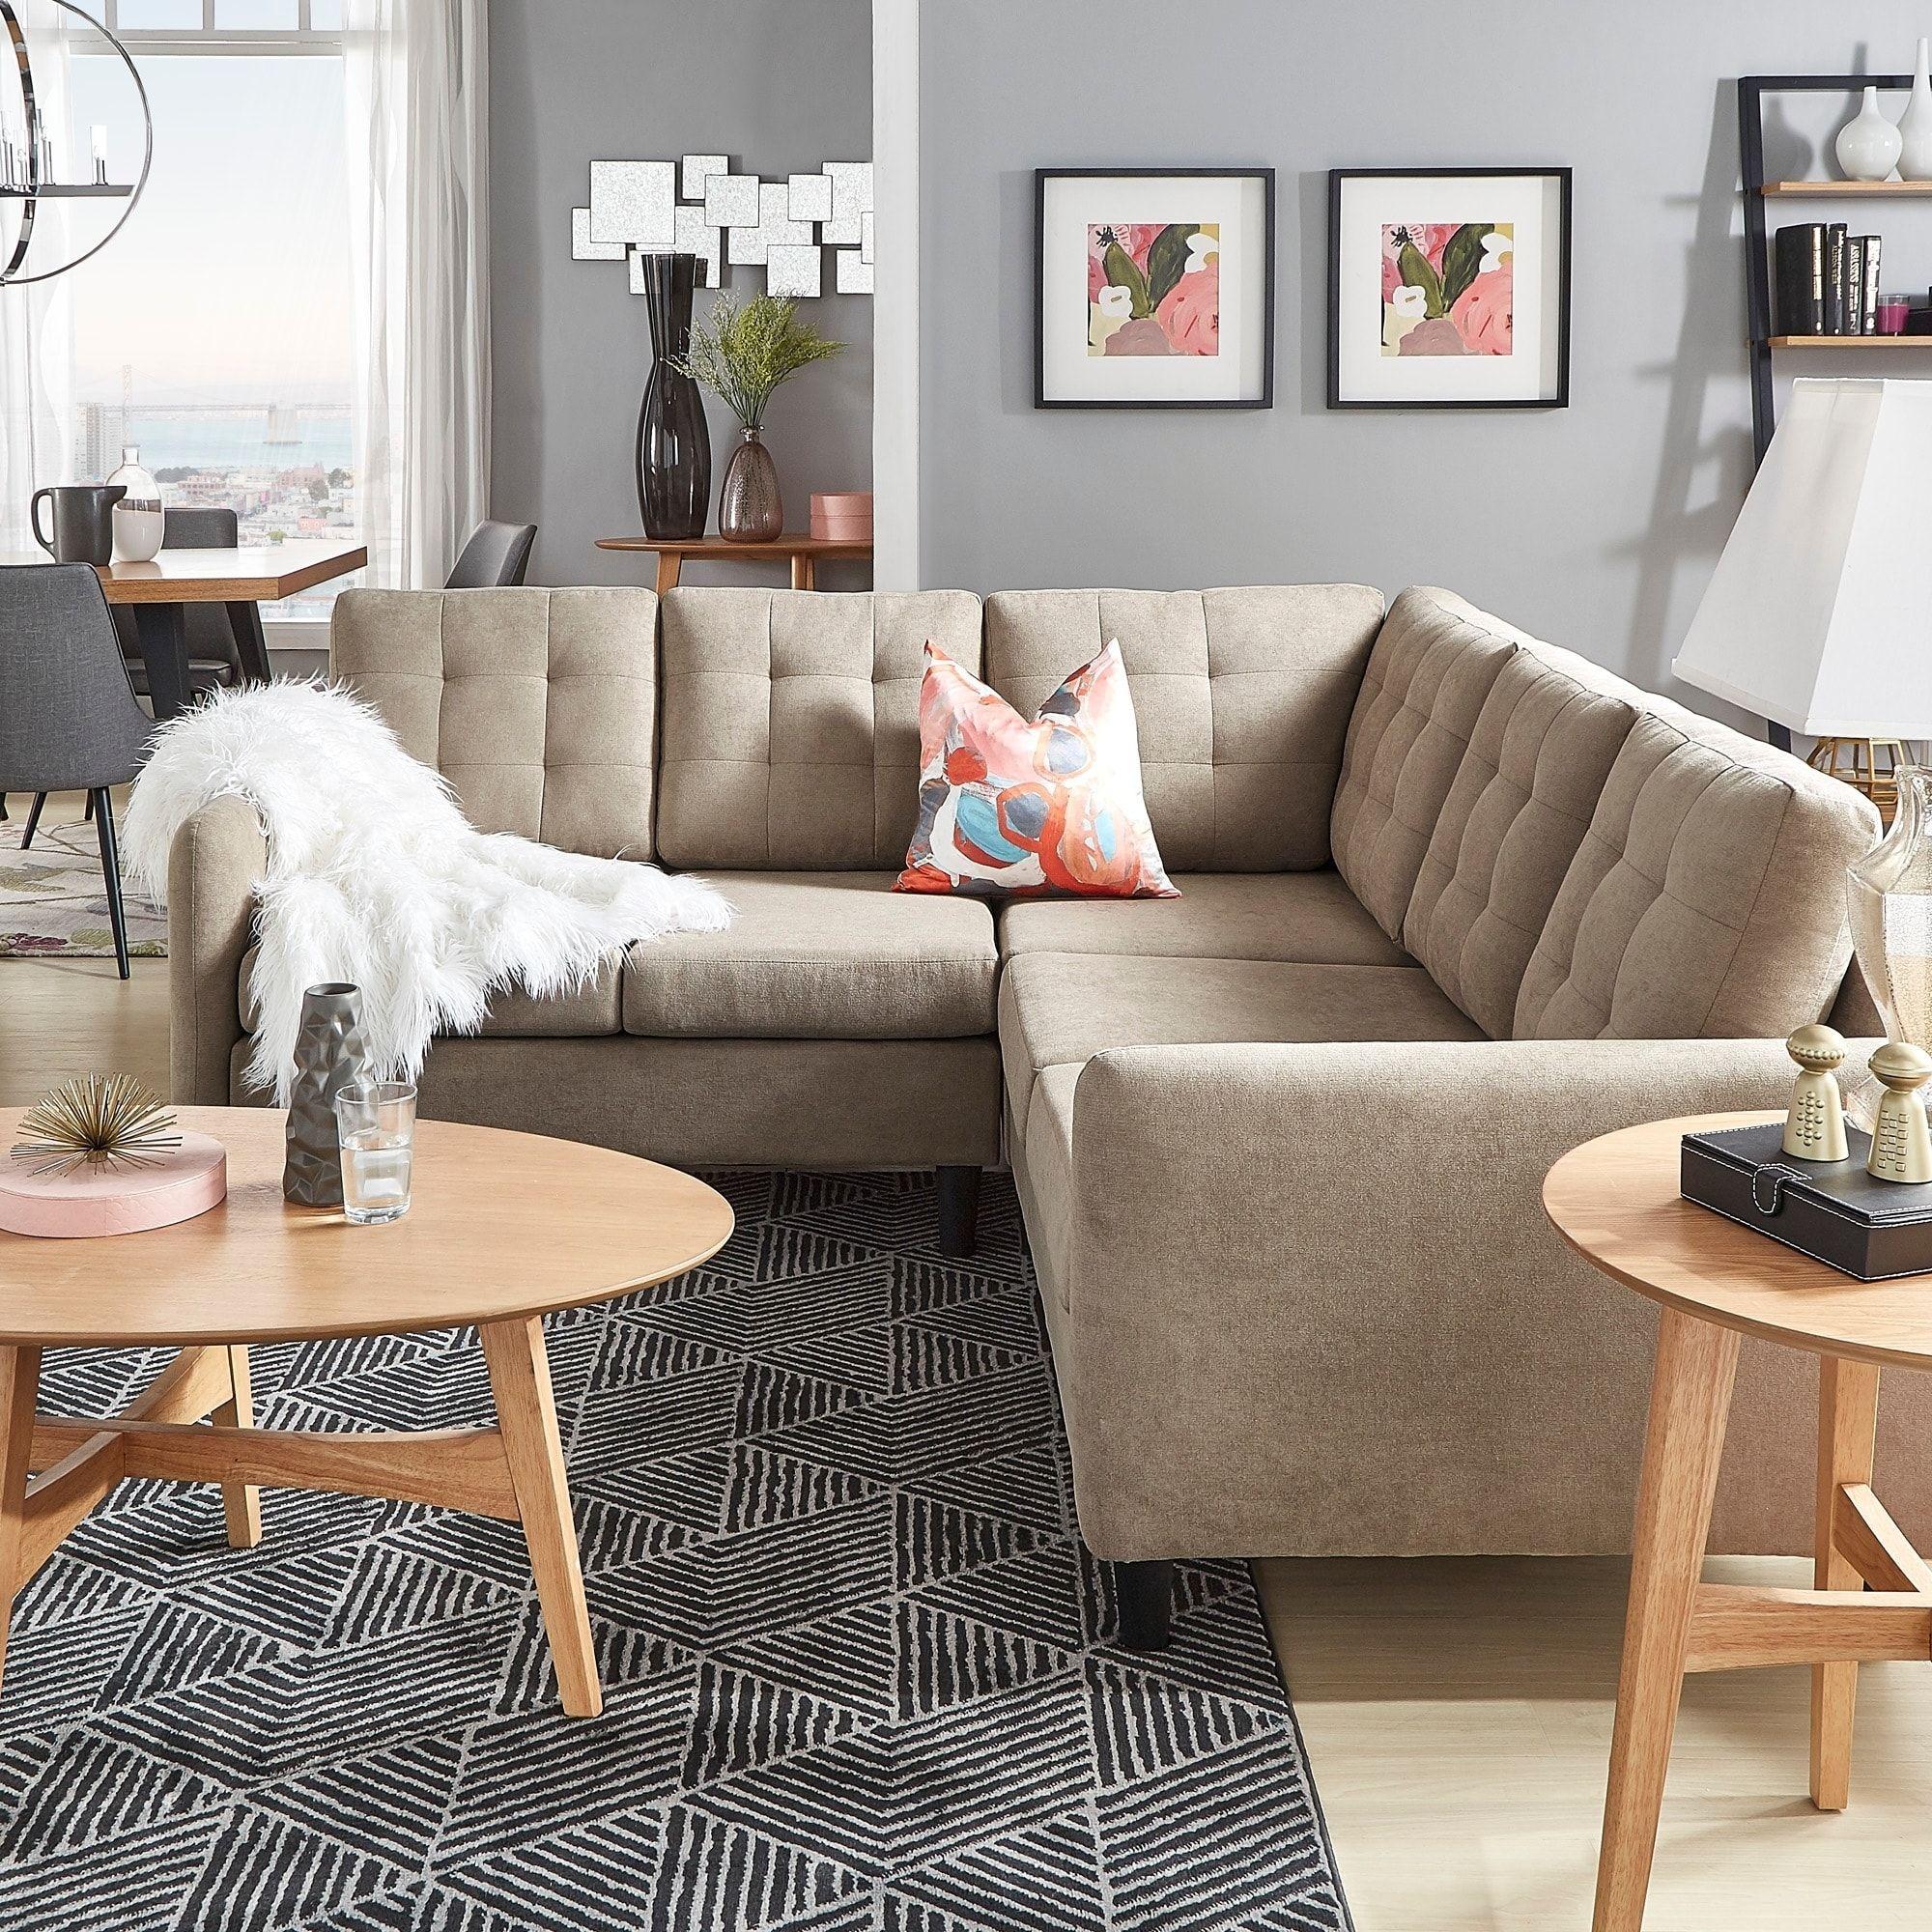 Remarkable Rivers Khaki Velvet Sectional By Inspire Q Modern Beige Creativecarmelina Interior Chair Design Creativecarmelinacom